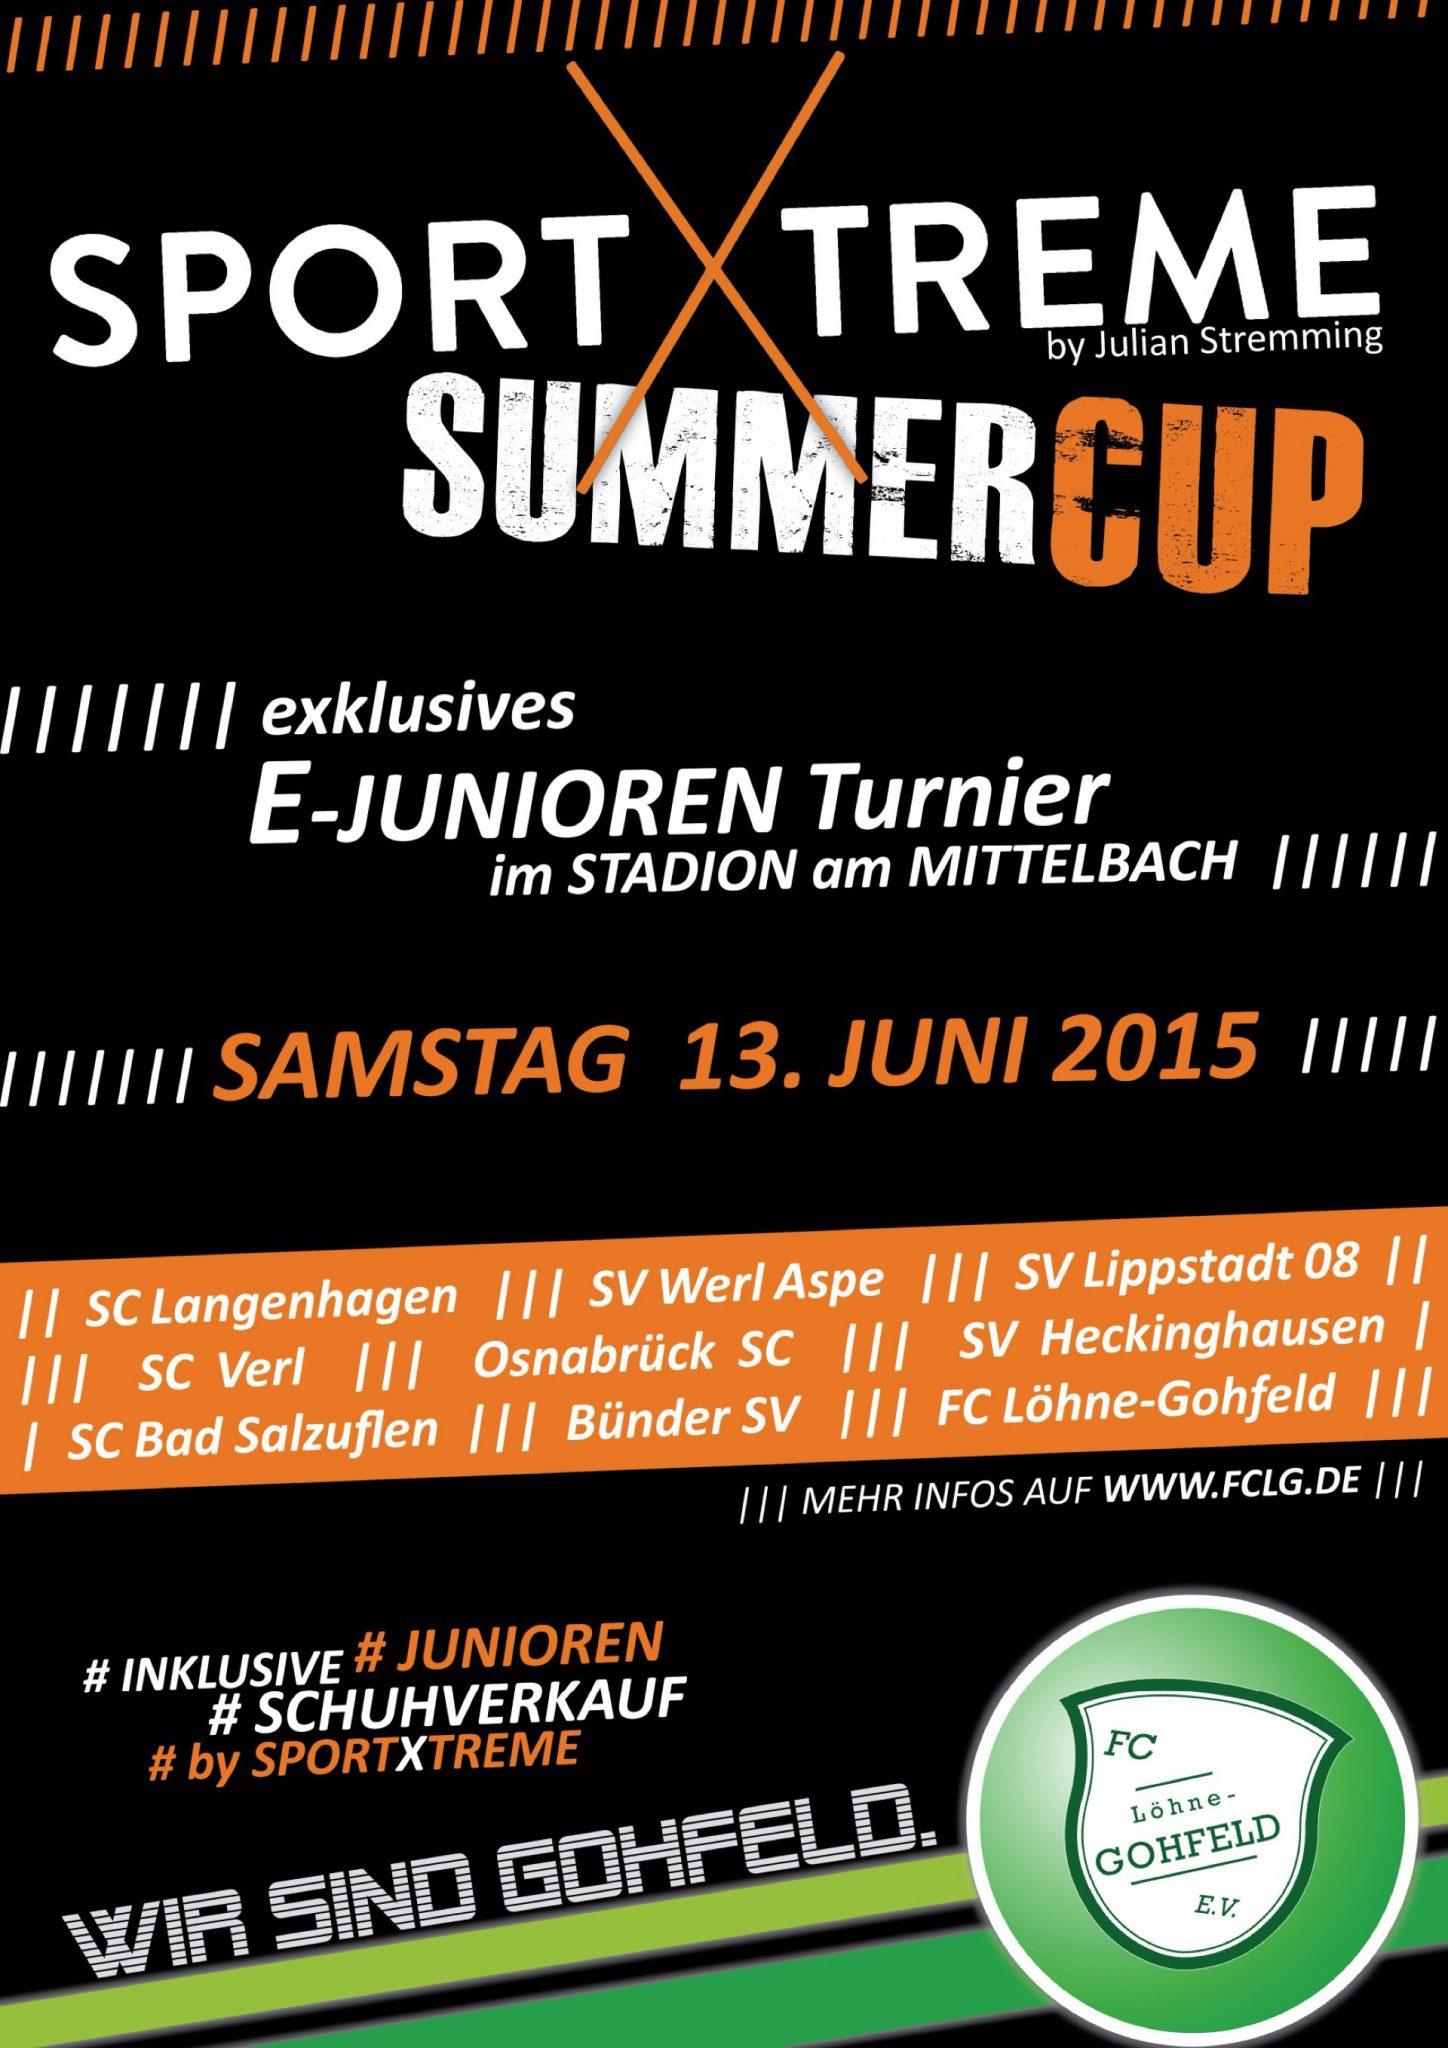 SportXtreme SummerCup